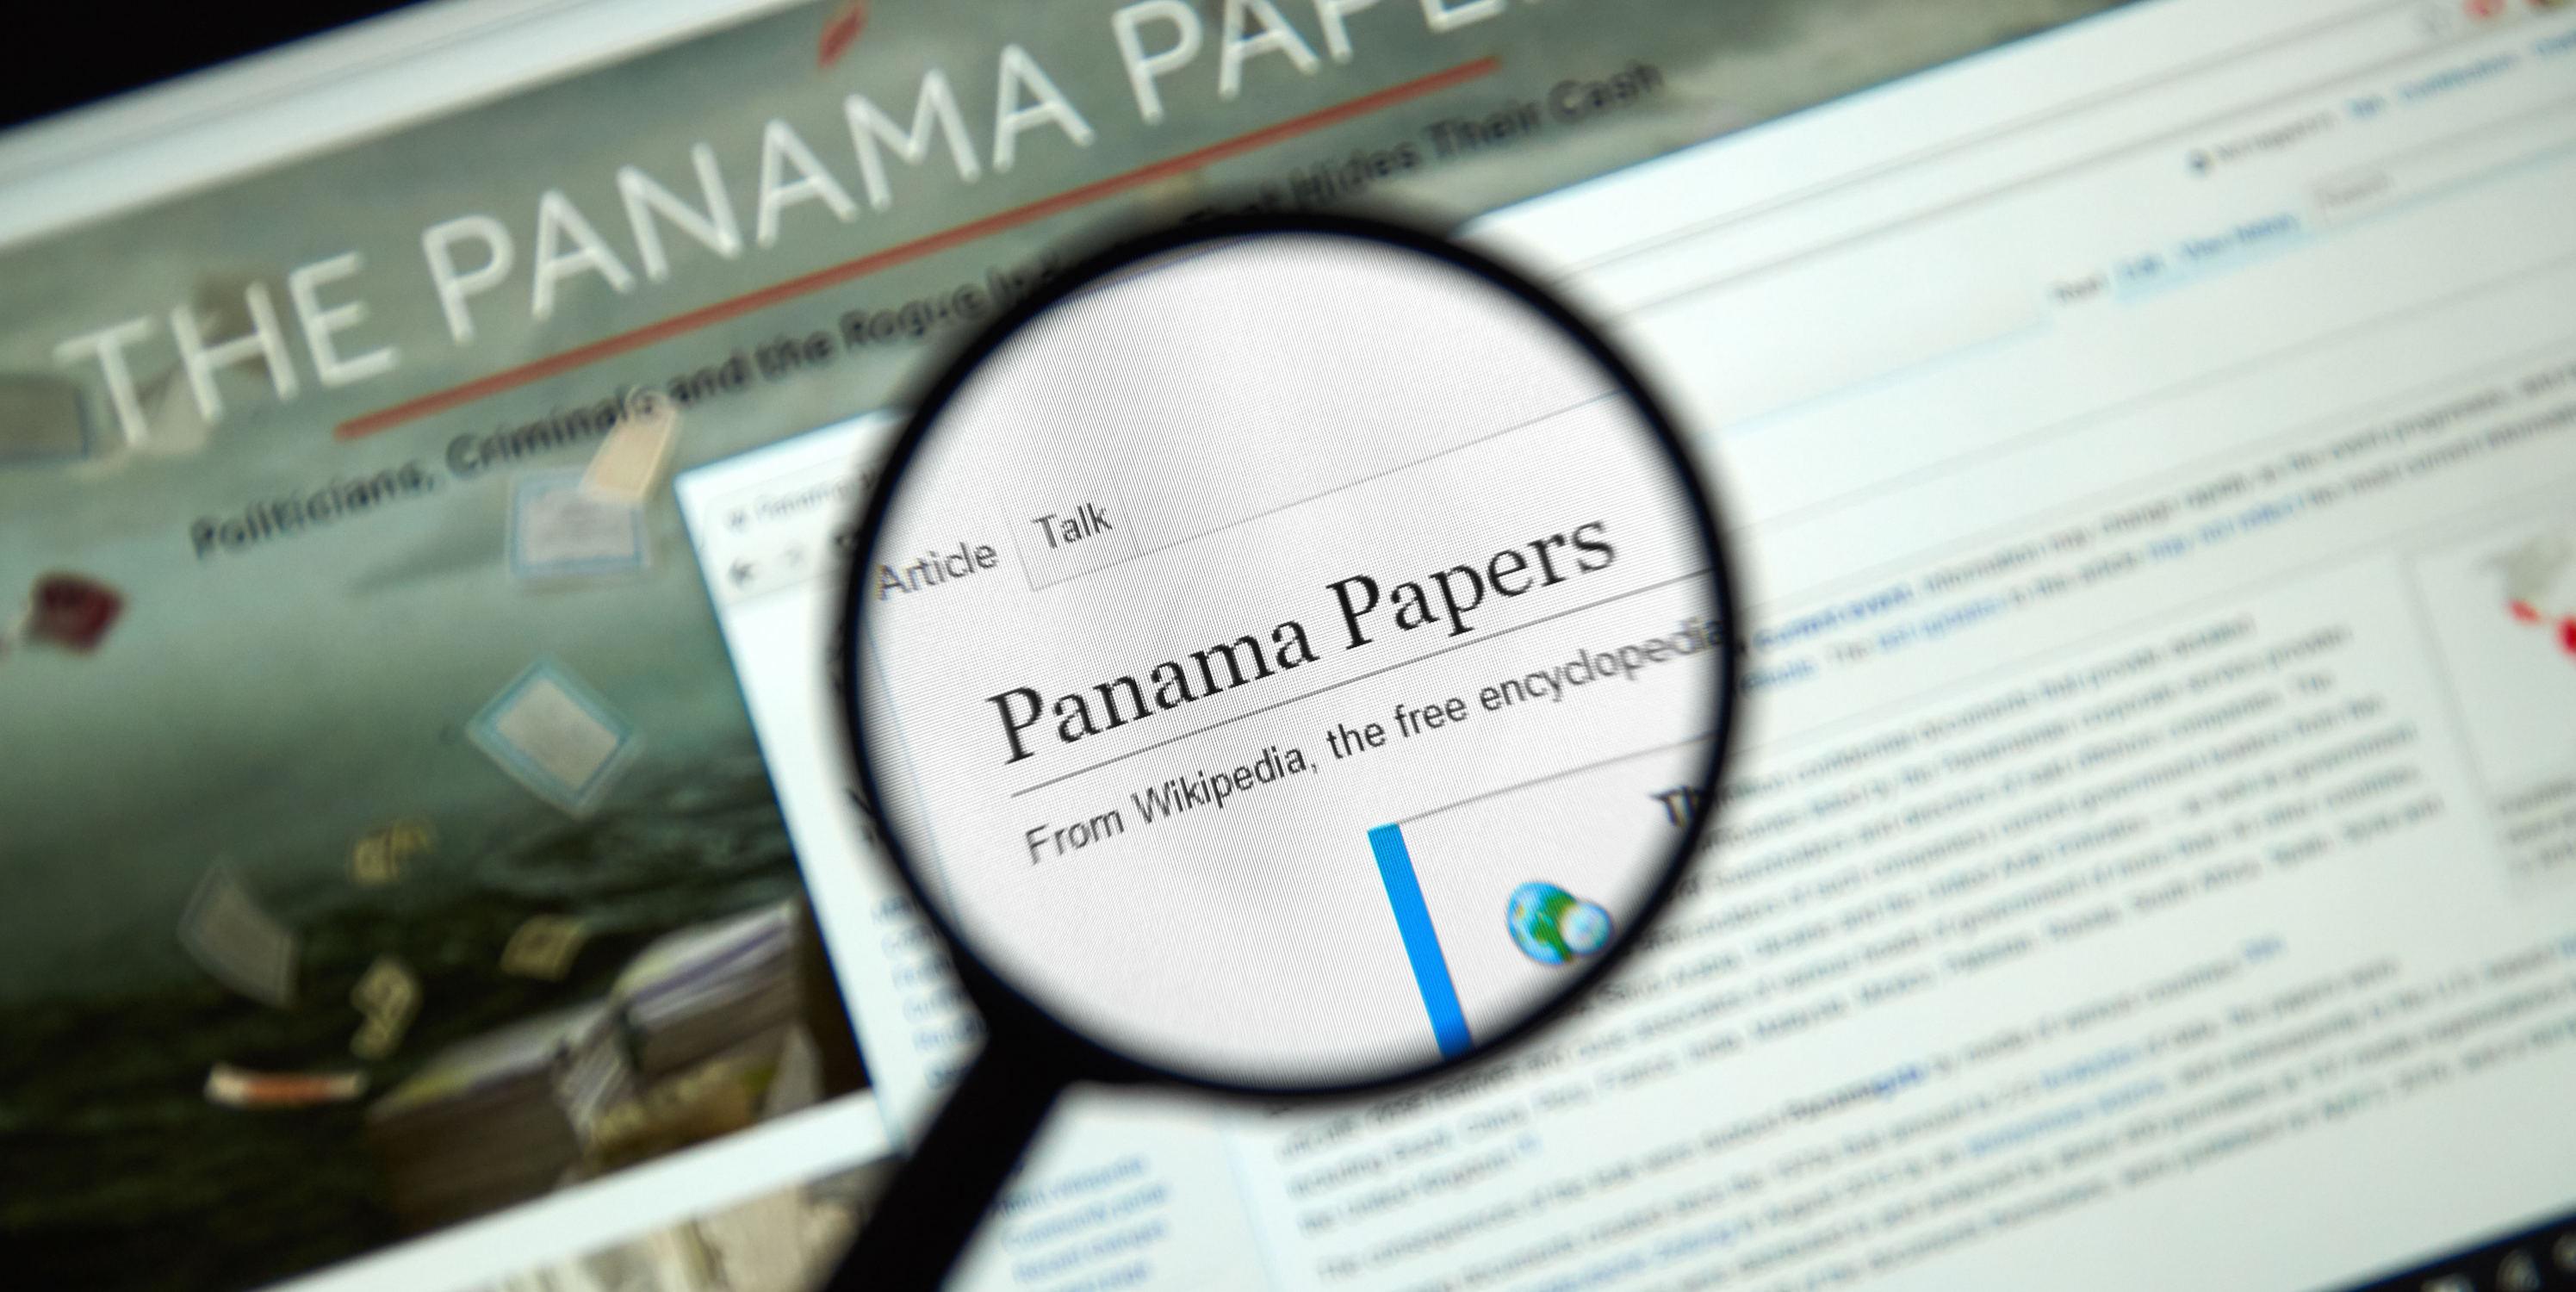 panama papers image